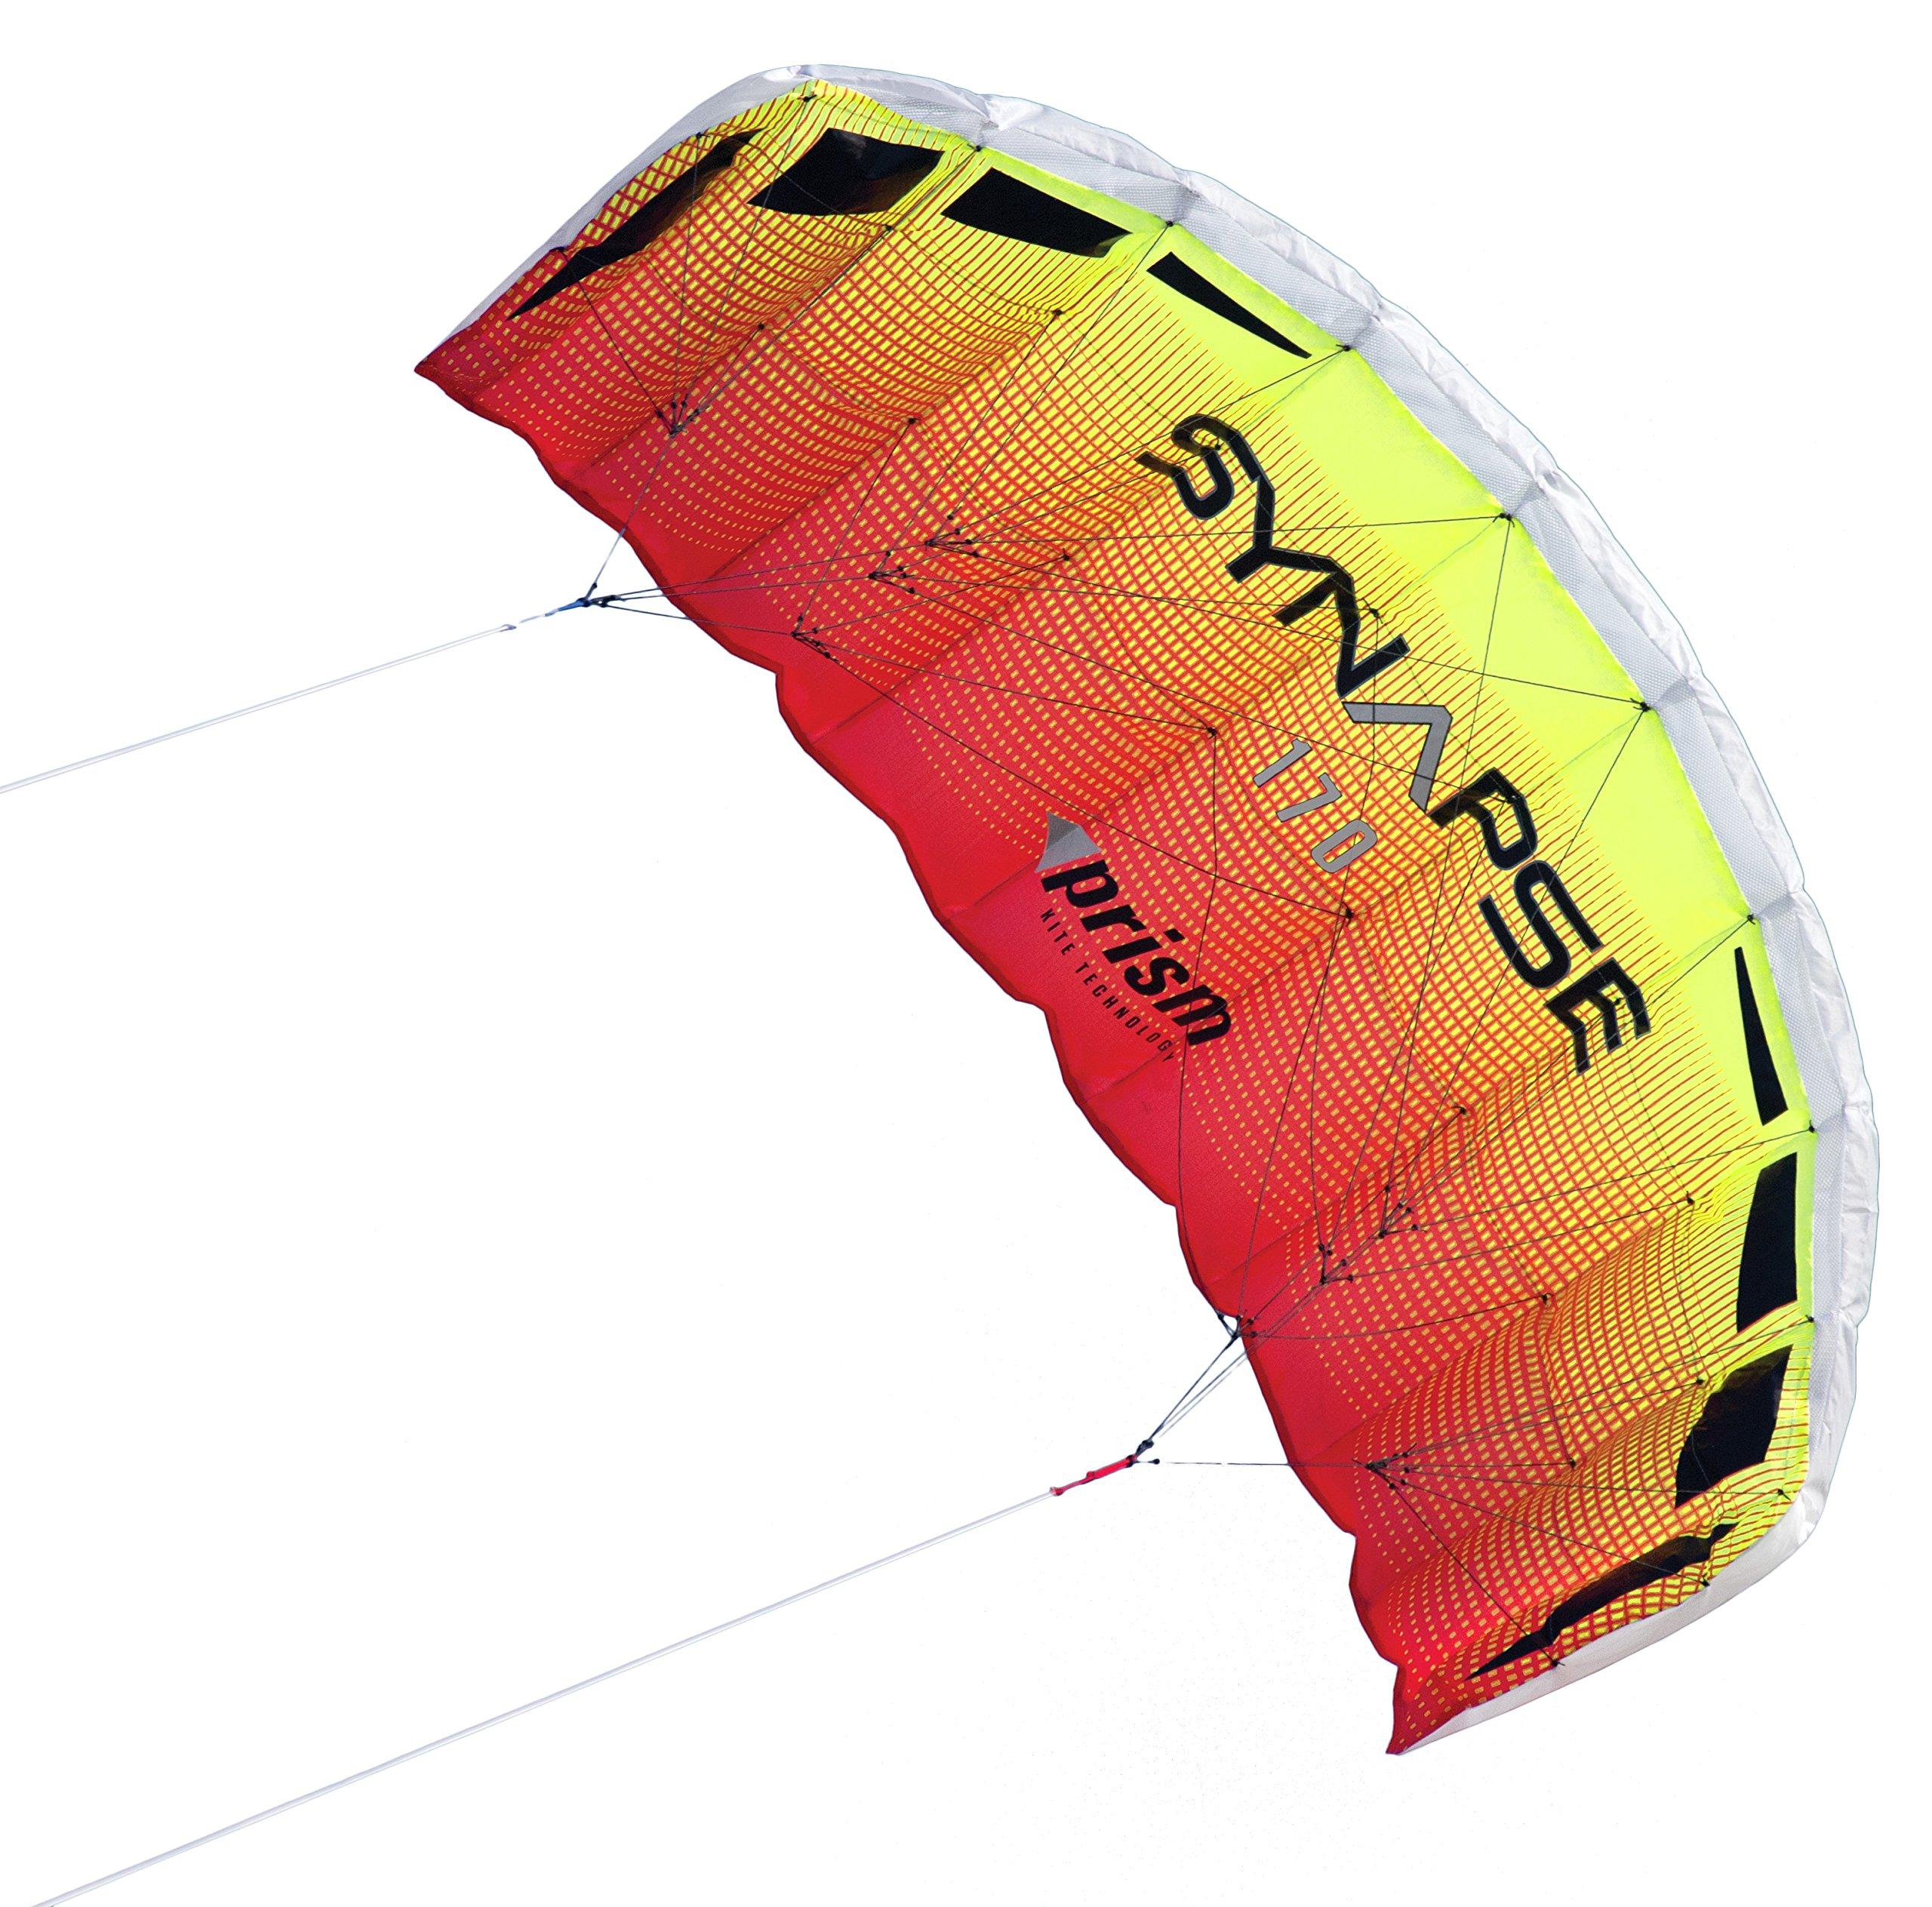 Prism Synapse Dual-line Parafoil Kite, 170 by Prism Kite Technology (Image #2)